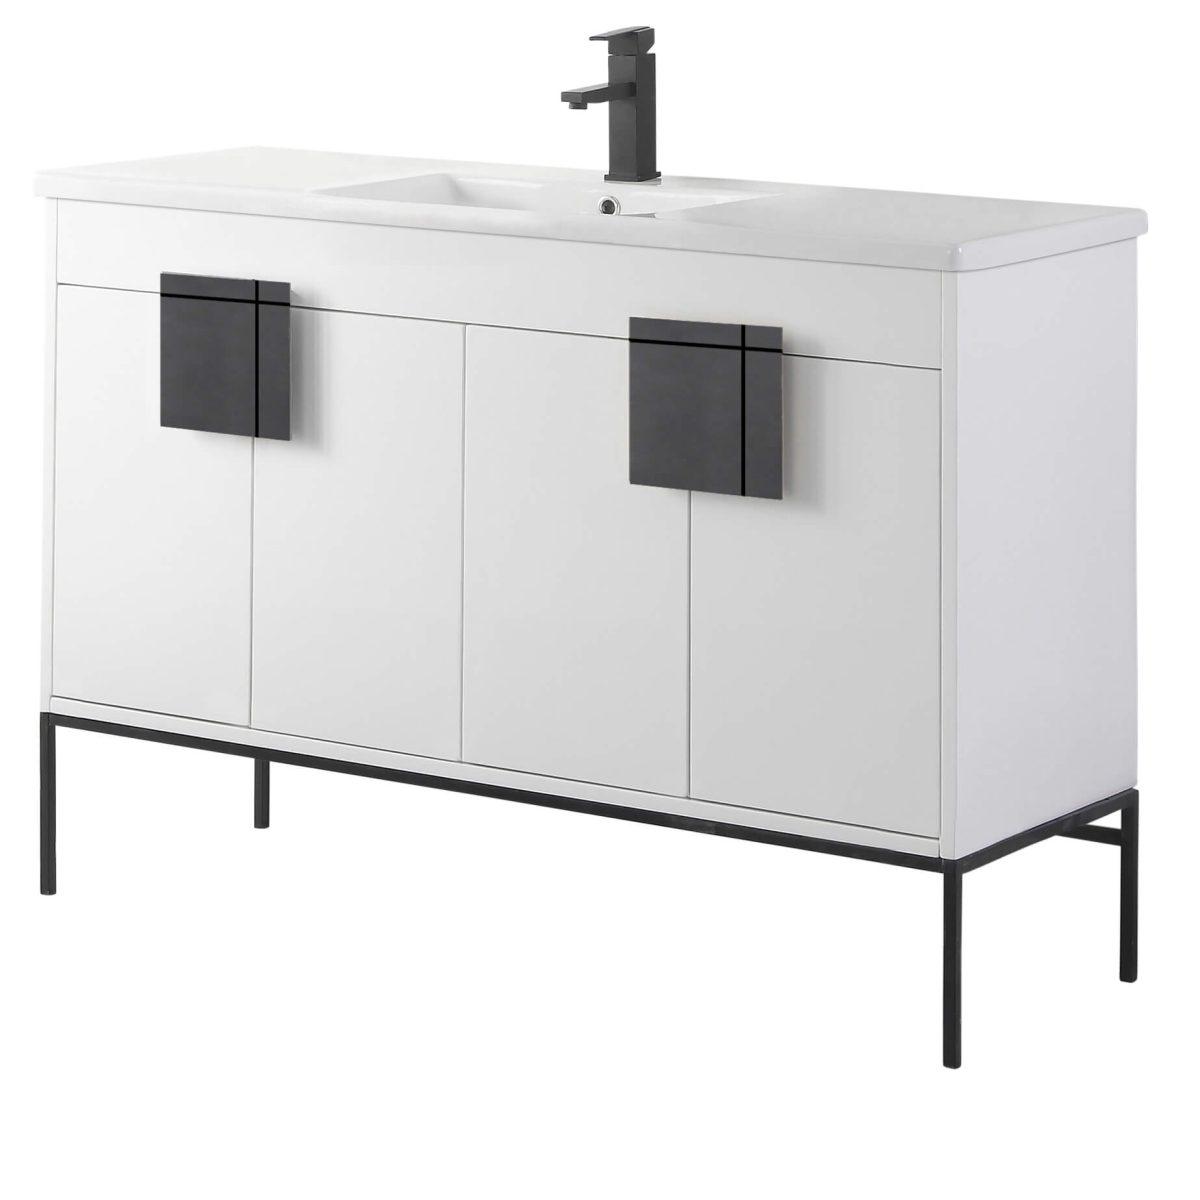 "Shawbridge 48"" Modern Single Bathroom Vanity  White with Black Hardware"